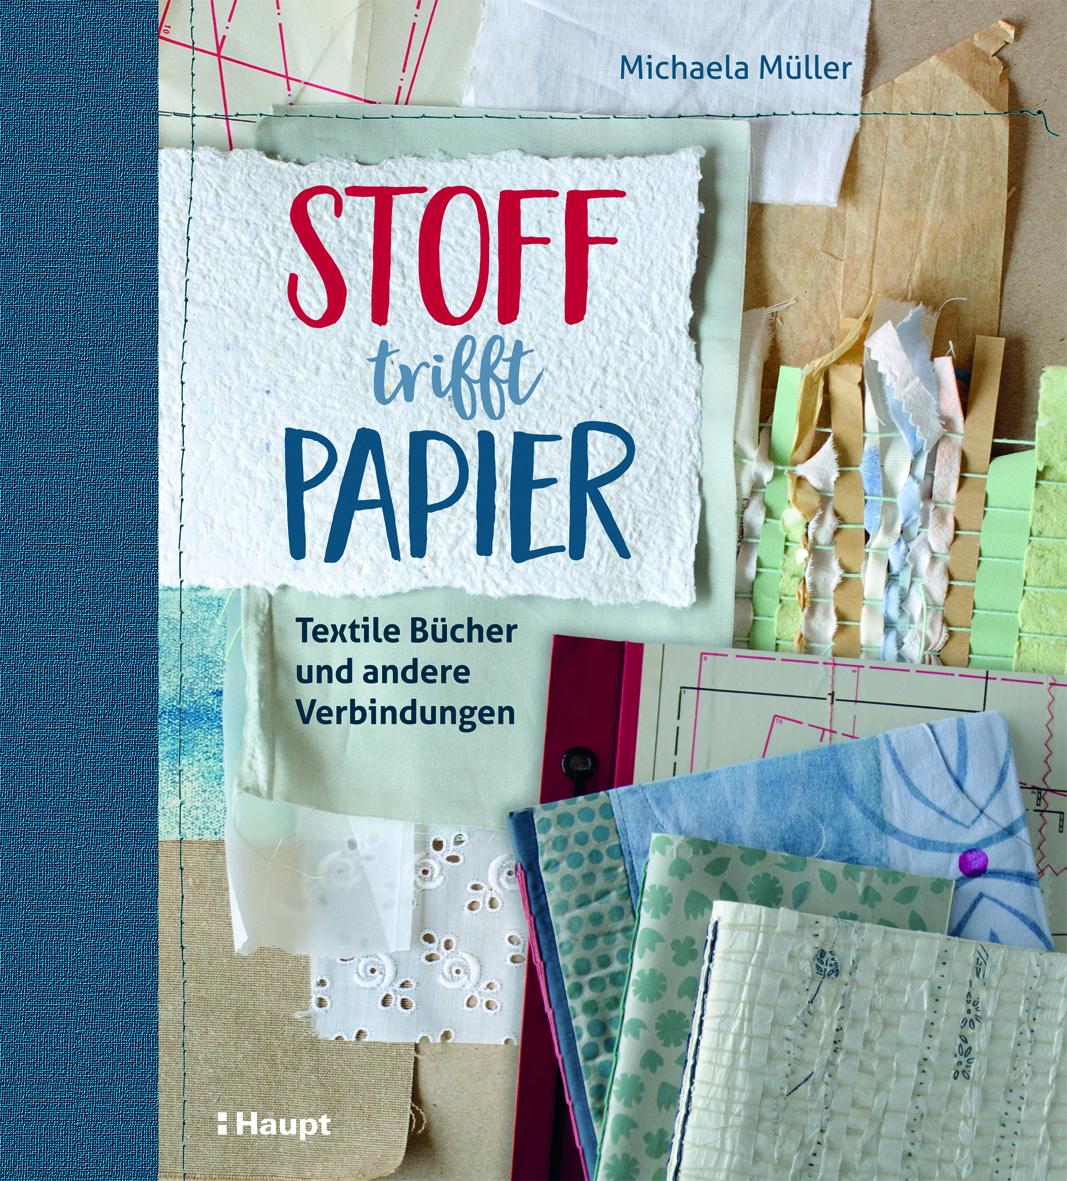 Preview image for LOM object Stoff trifft Papier - Textile Bücher und andere Verbindungen